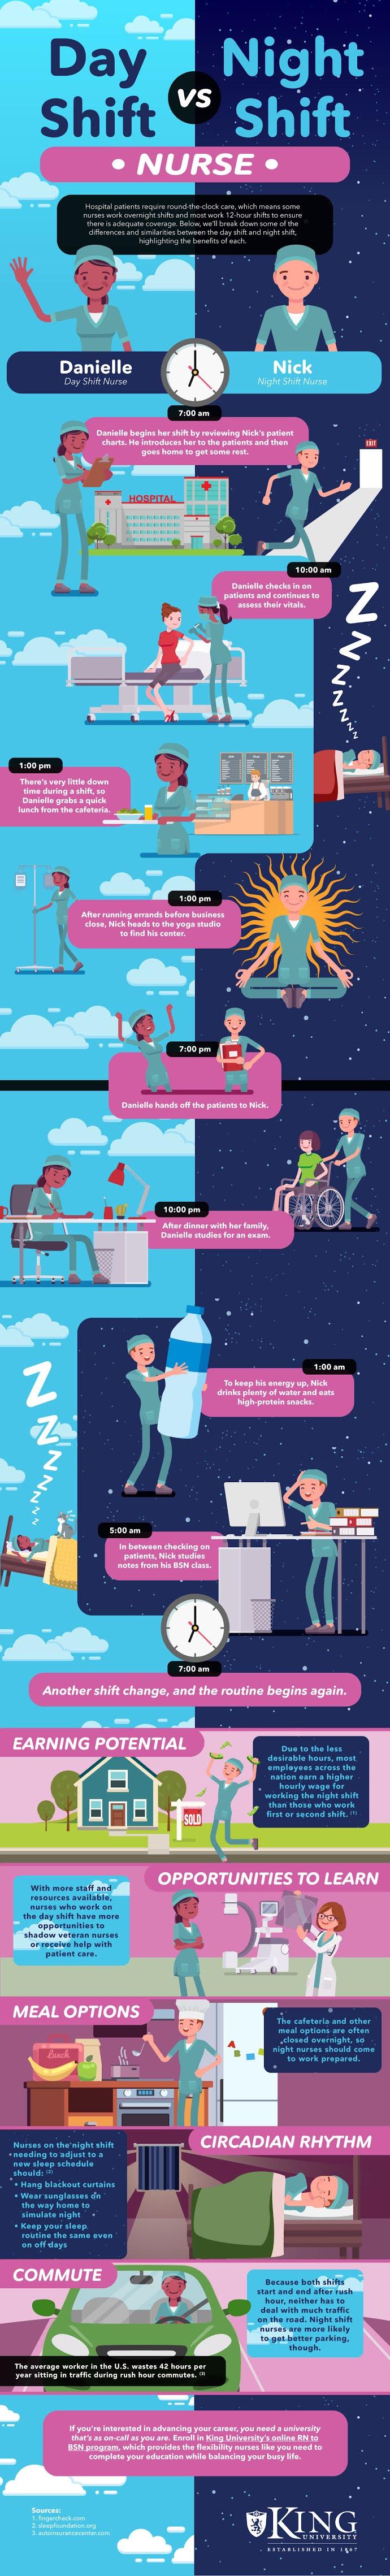 Day Shift vs. Night Shift Nurses #infographic